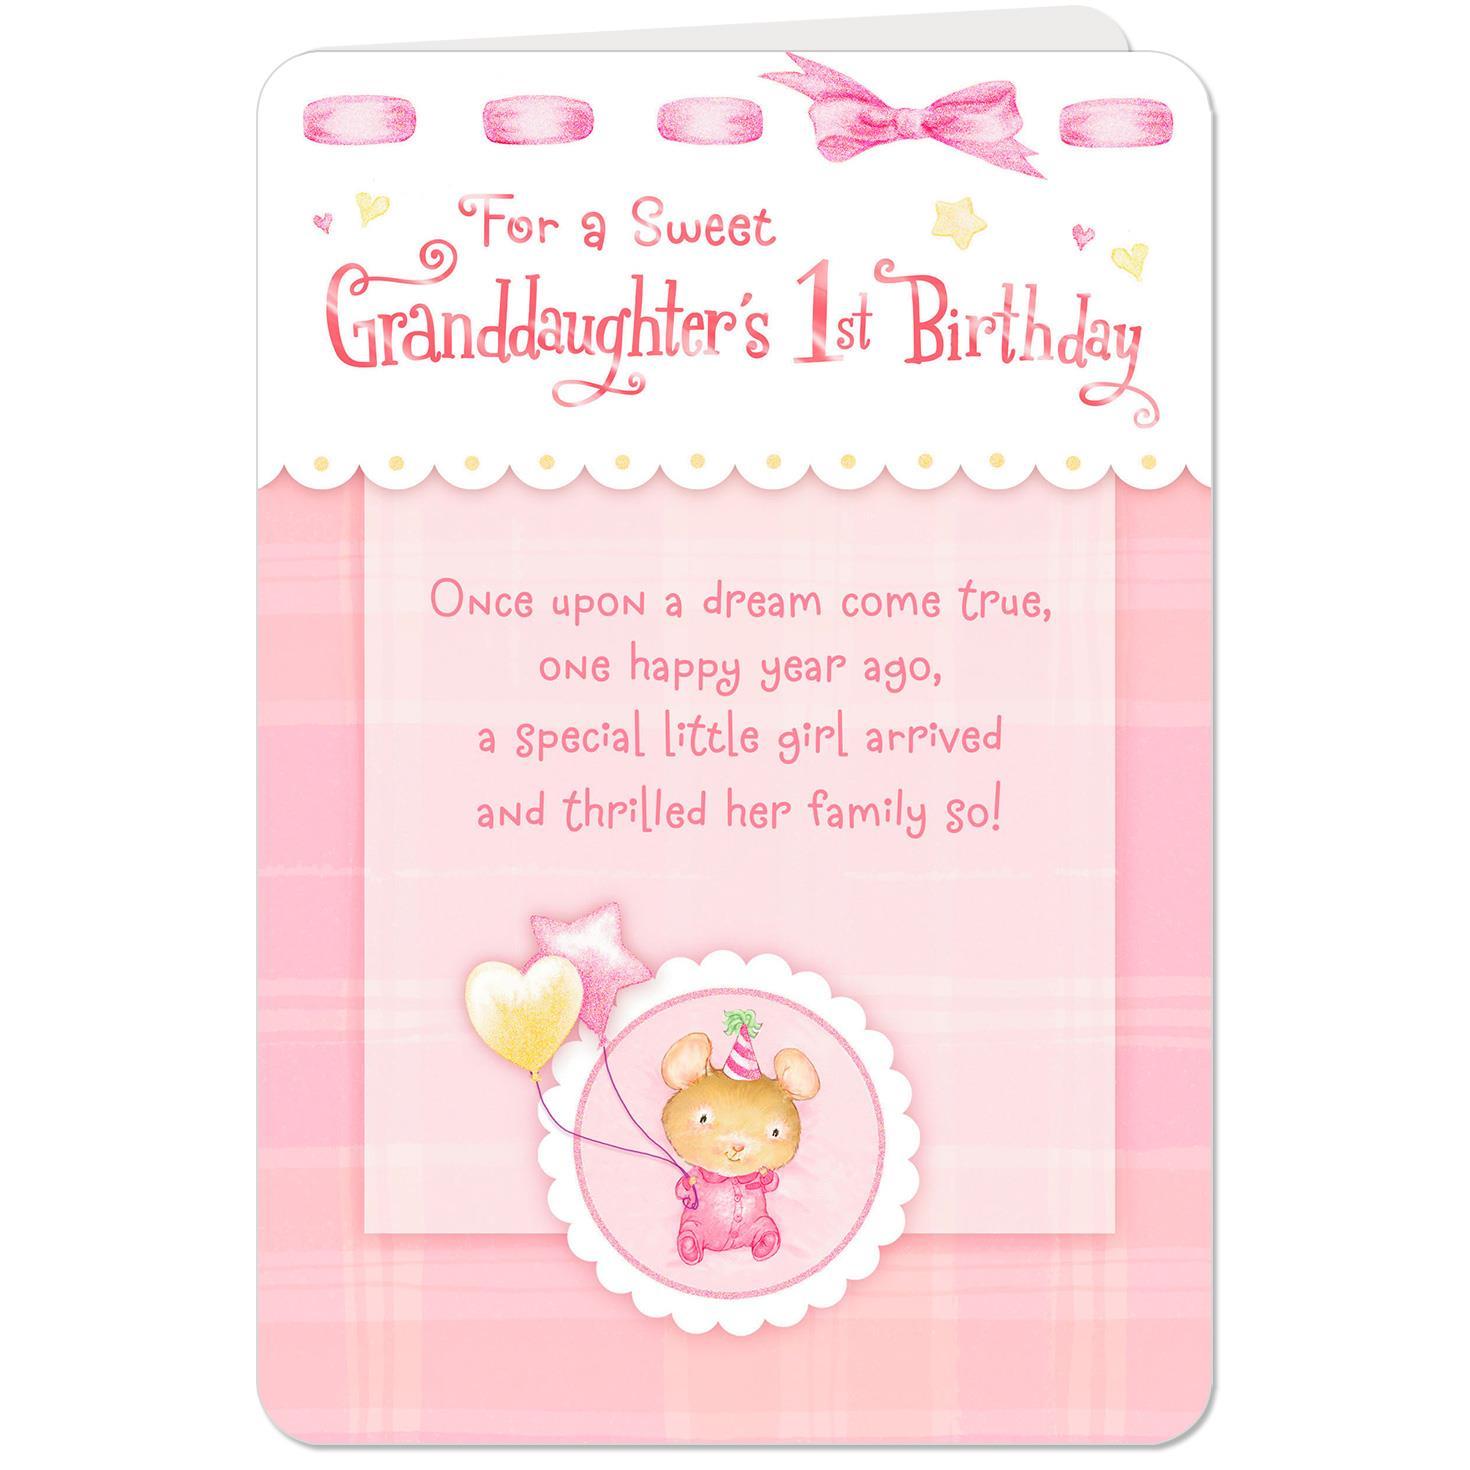 Dream Come True 1st Birthday Card For Granddaughter